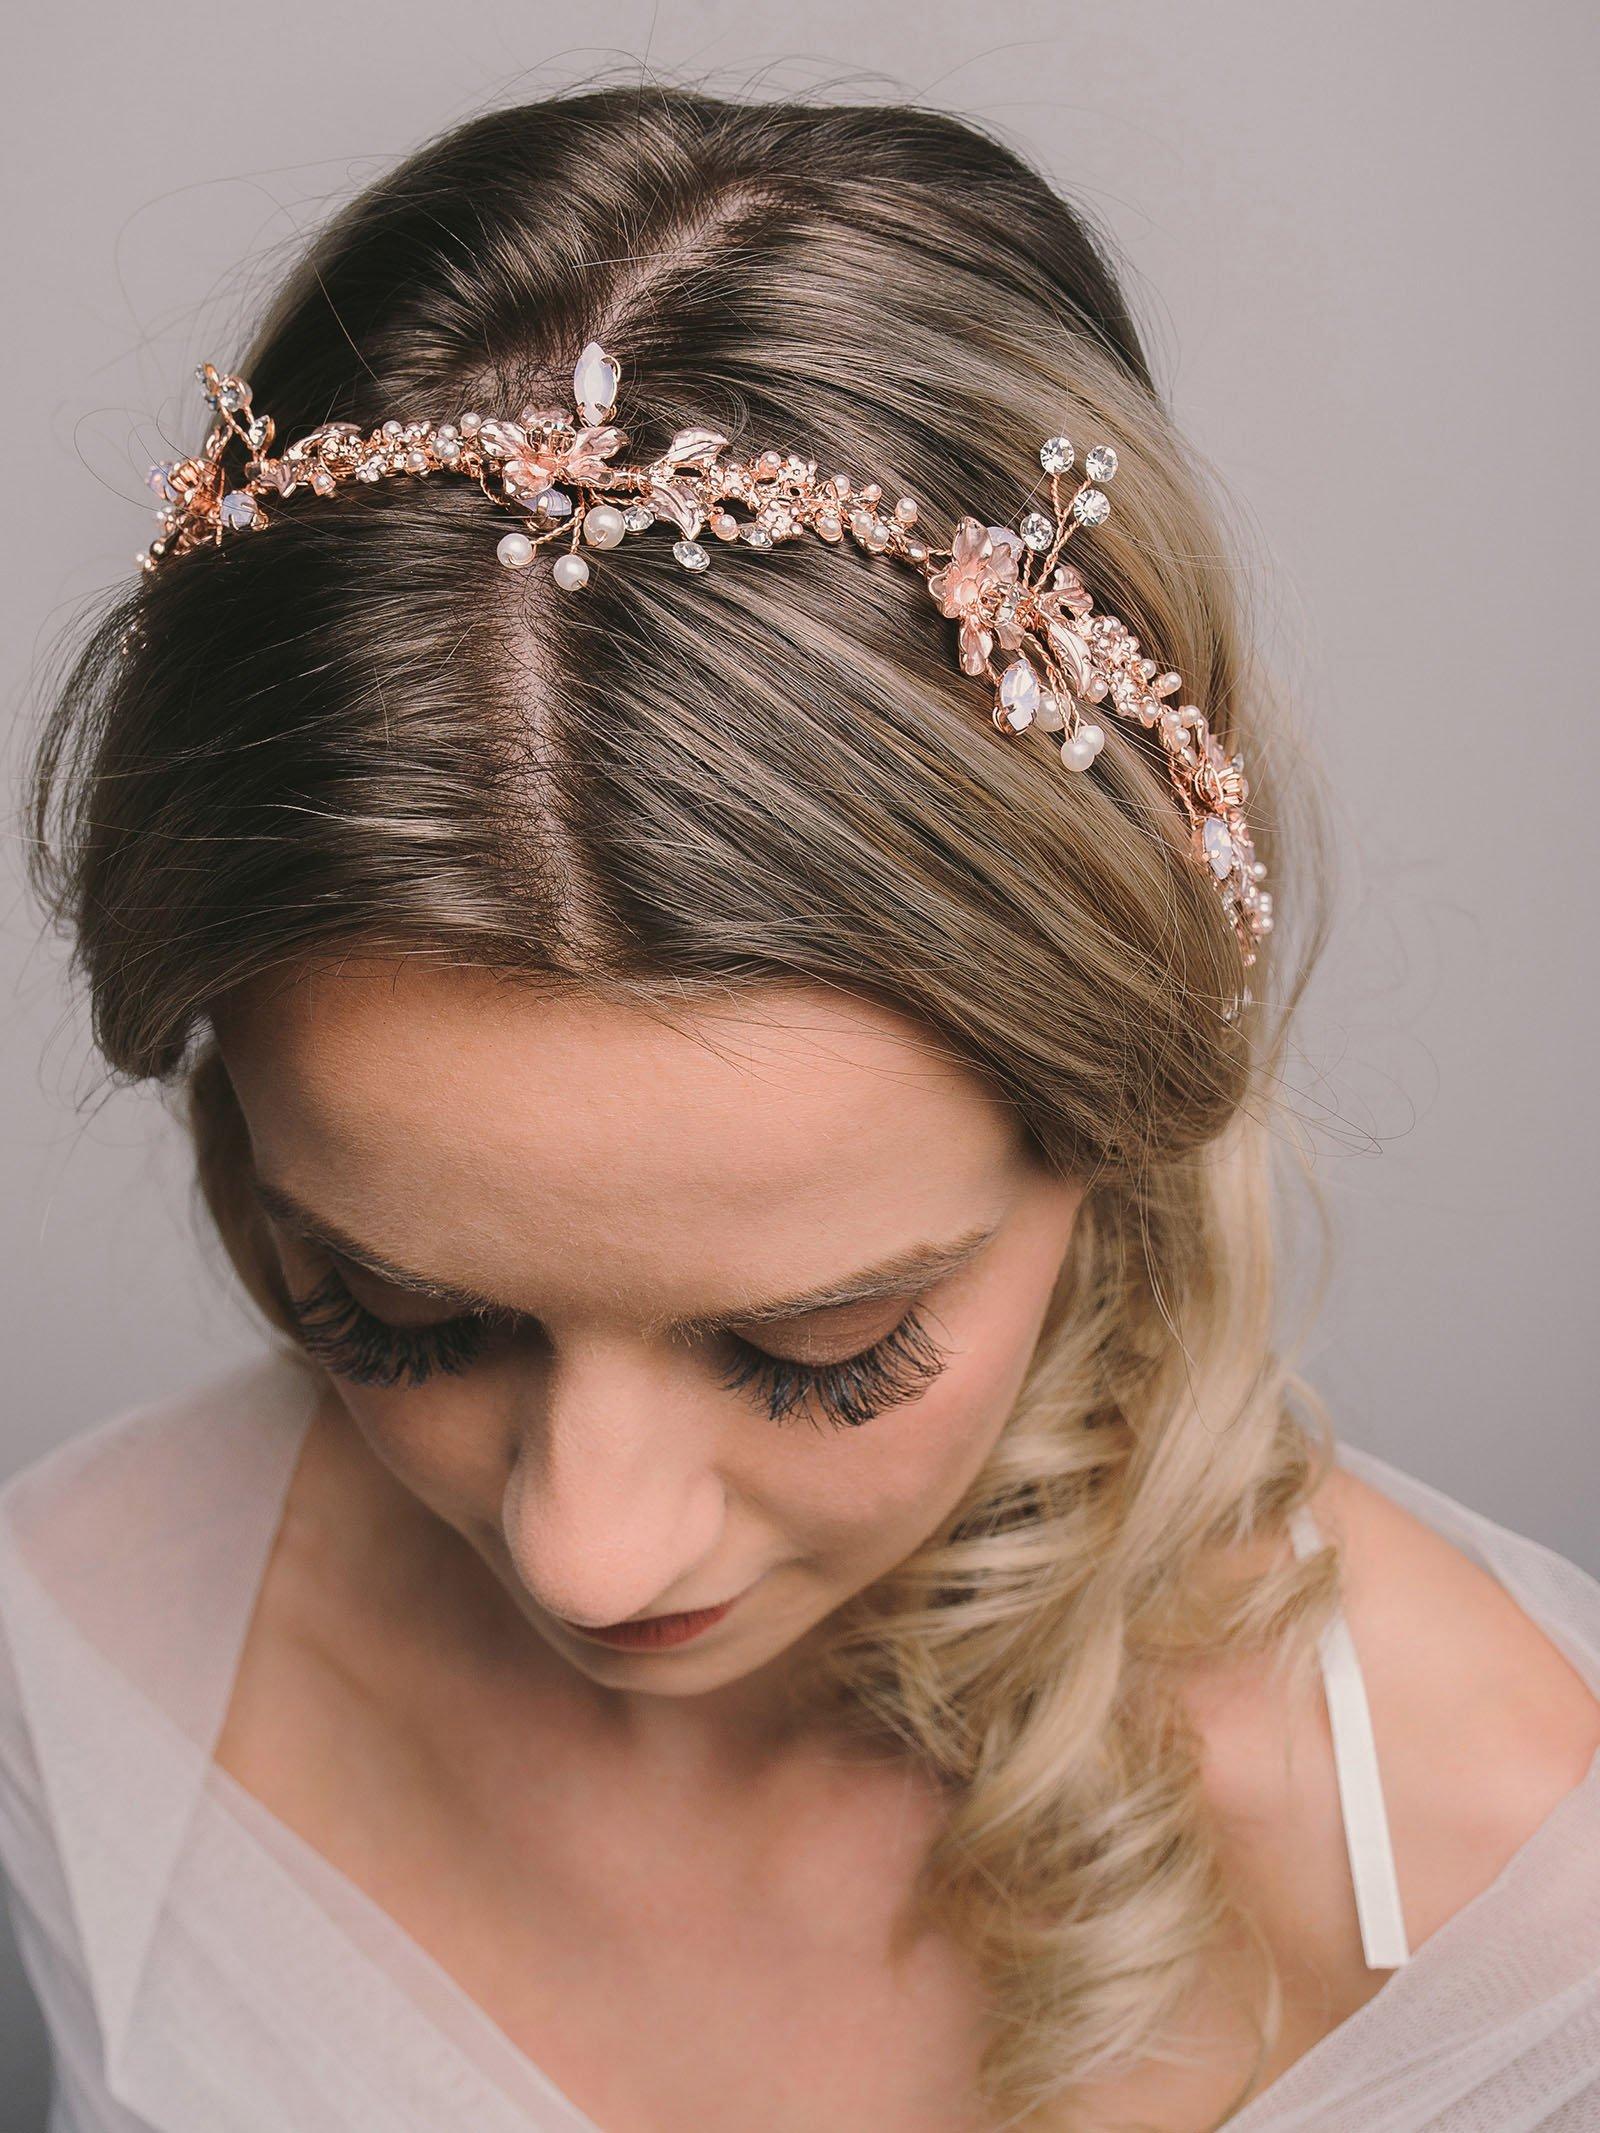 SWEETV Rose Gold Bridal Headband Tiara Wedding Vine Flower Halo Handmade Pearl Women Hair Accessories